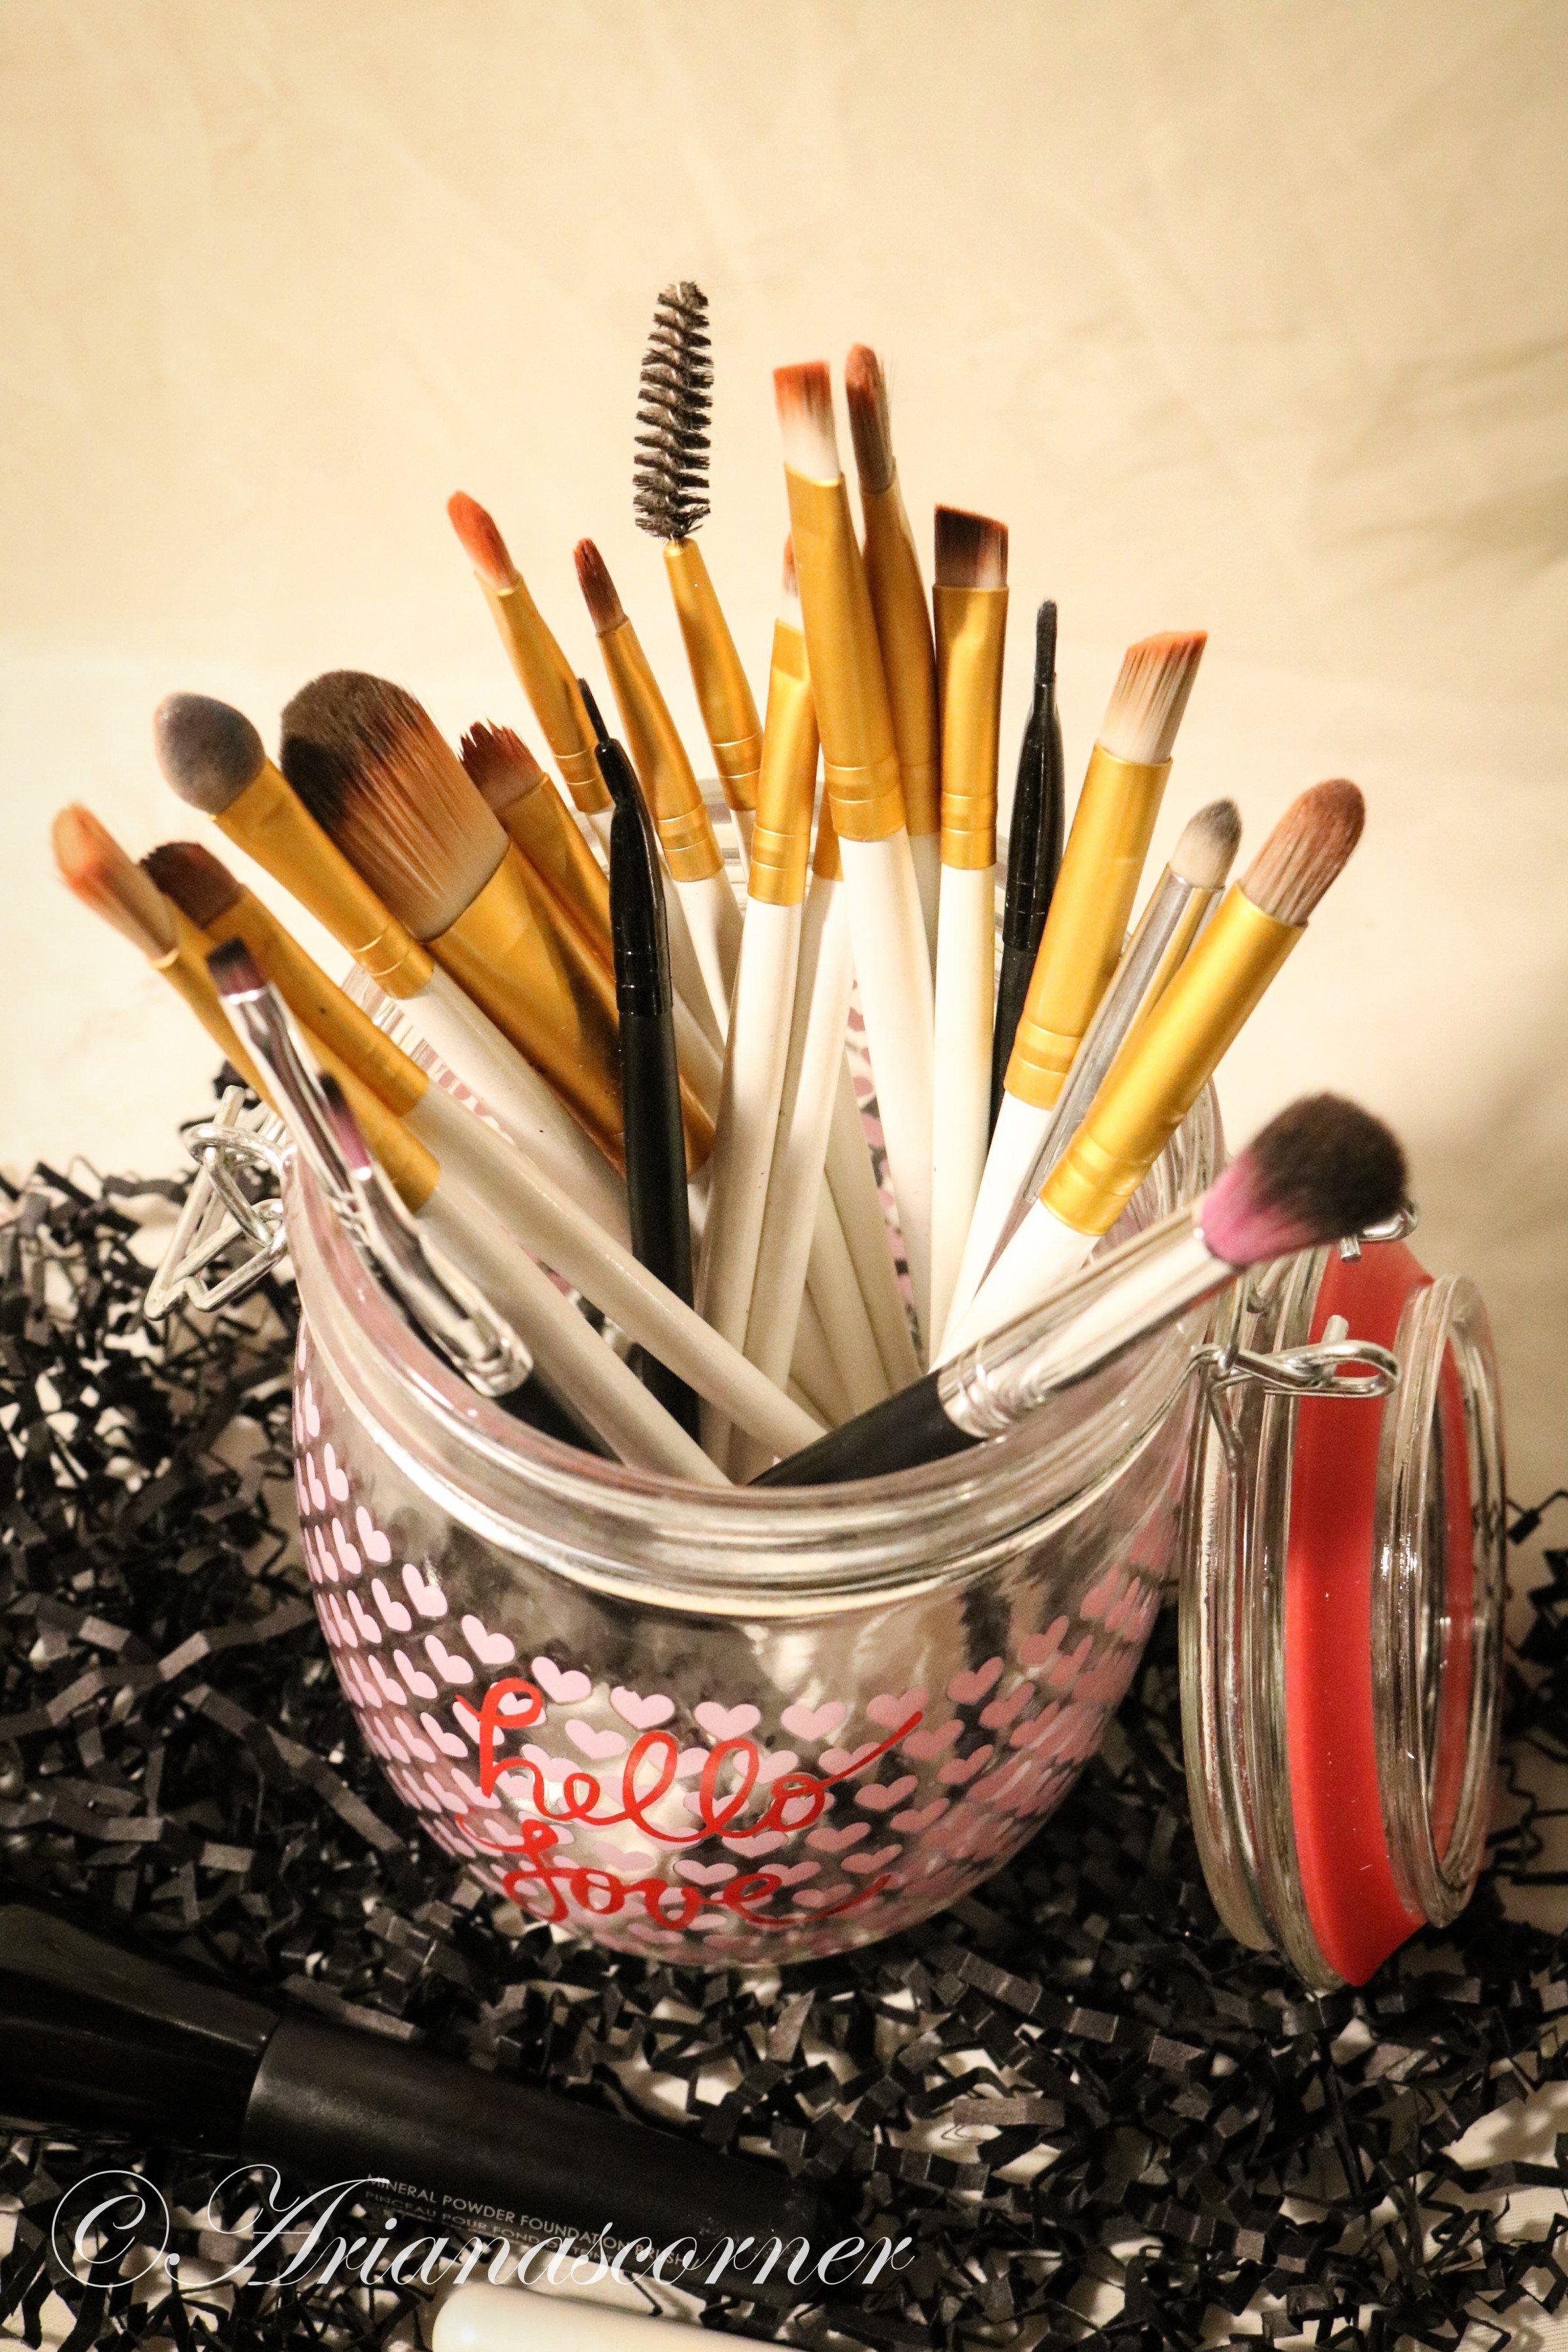 Makeup Brush Guide for Beginners Makeup ideas Makeup